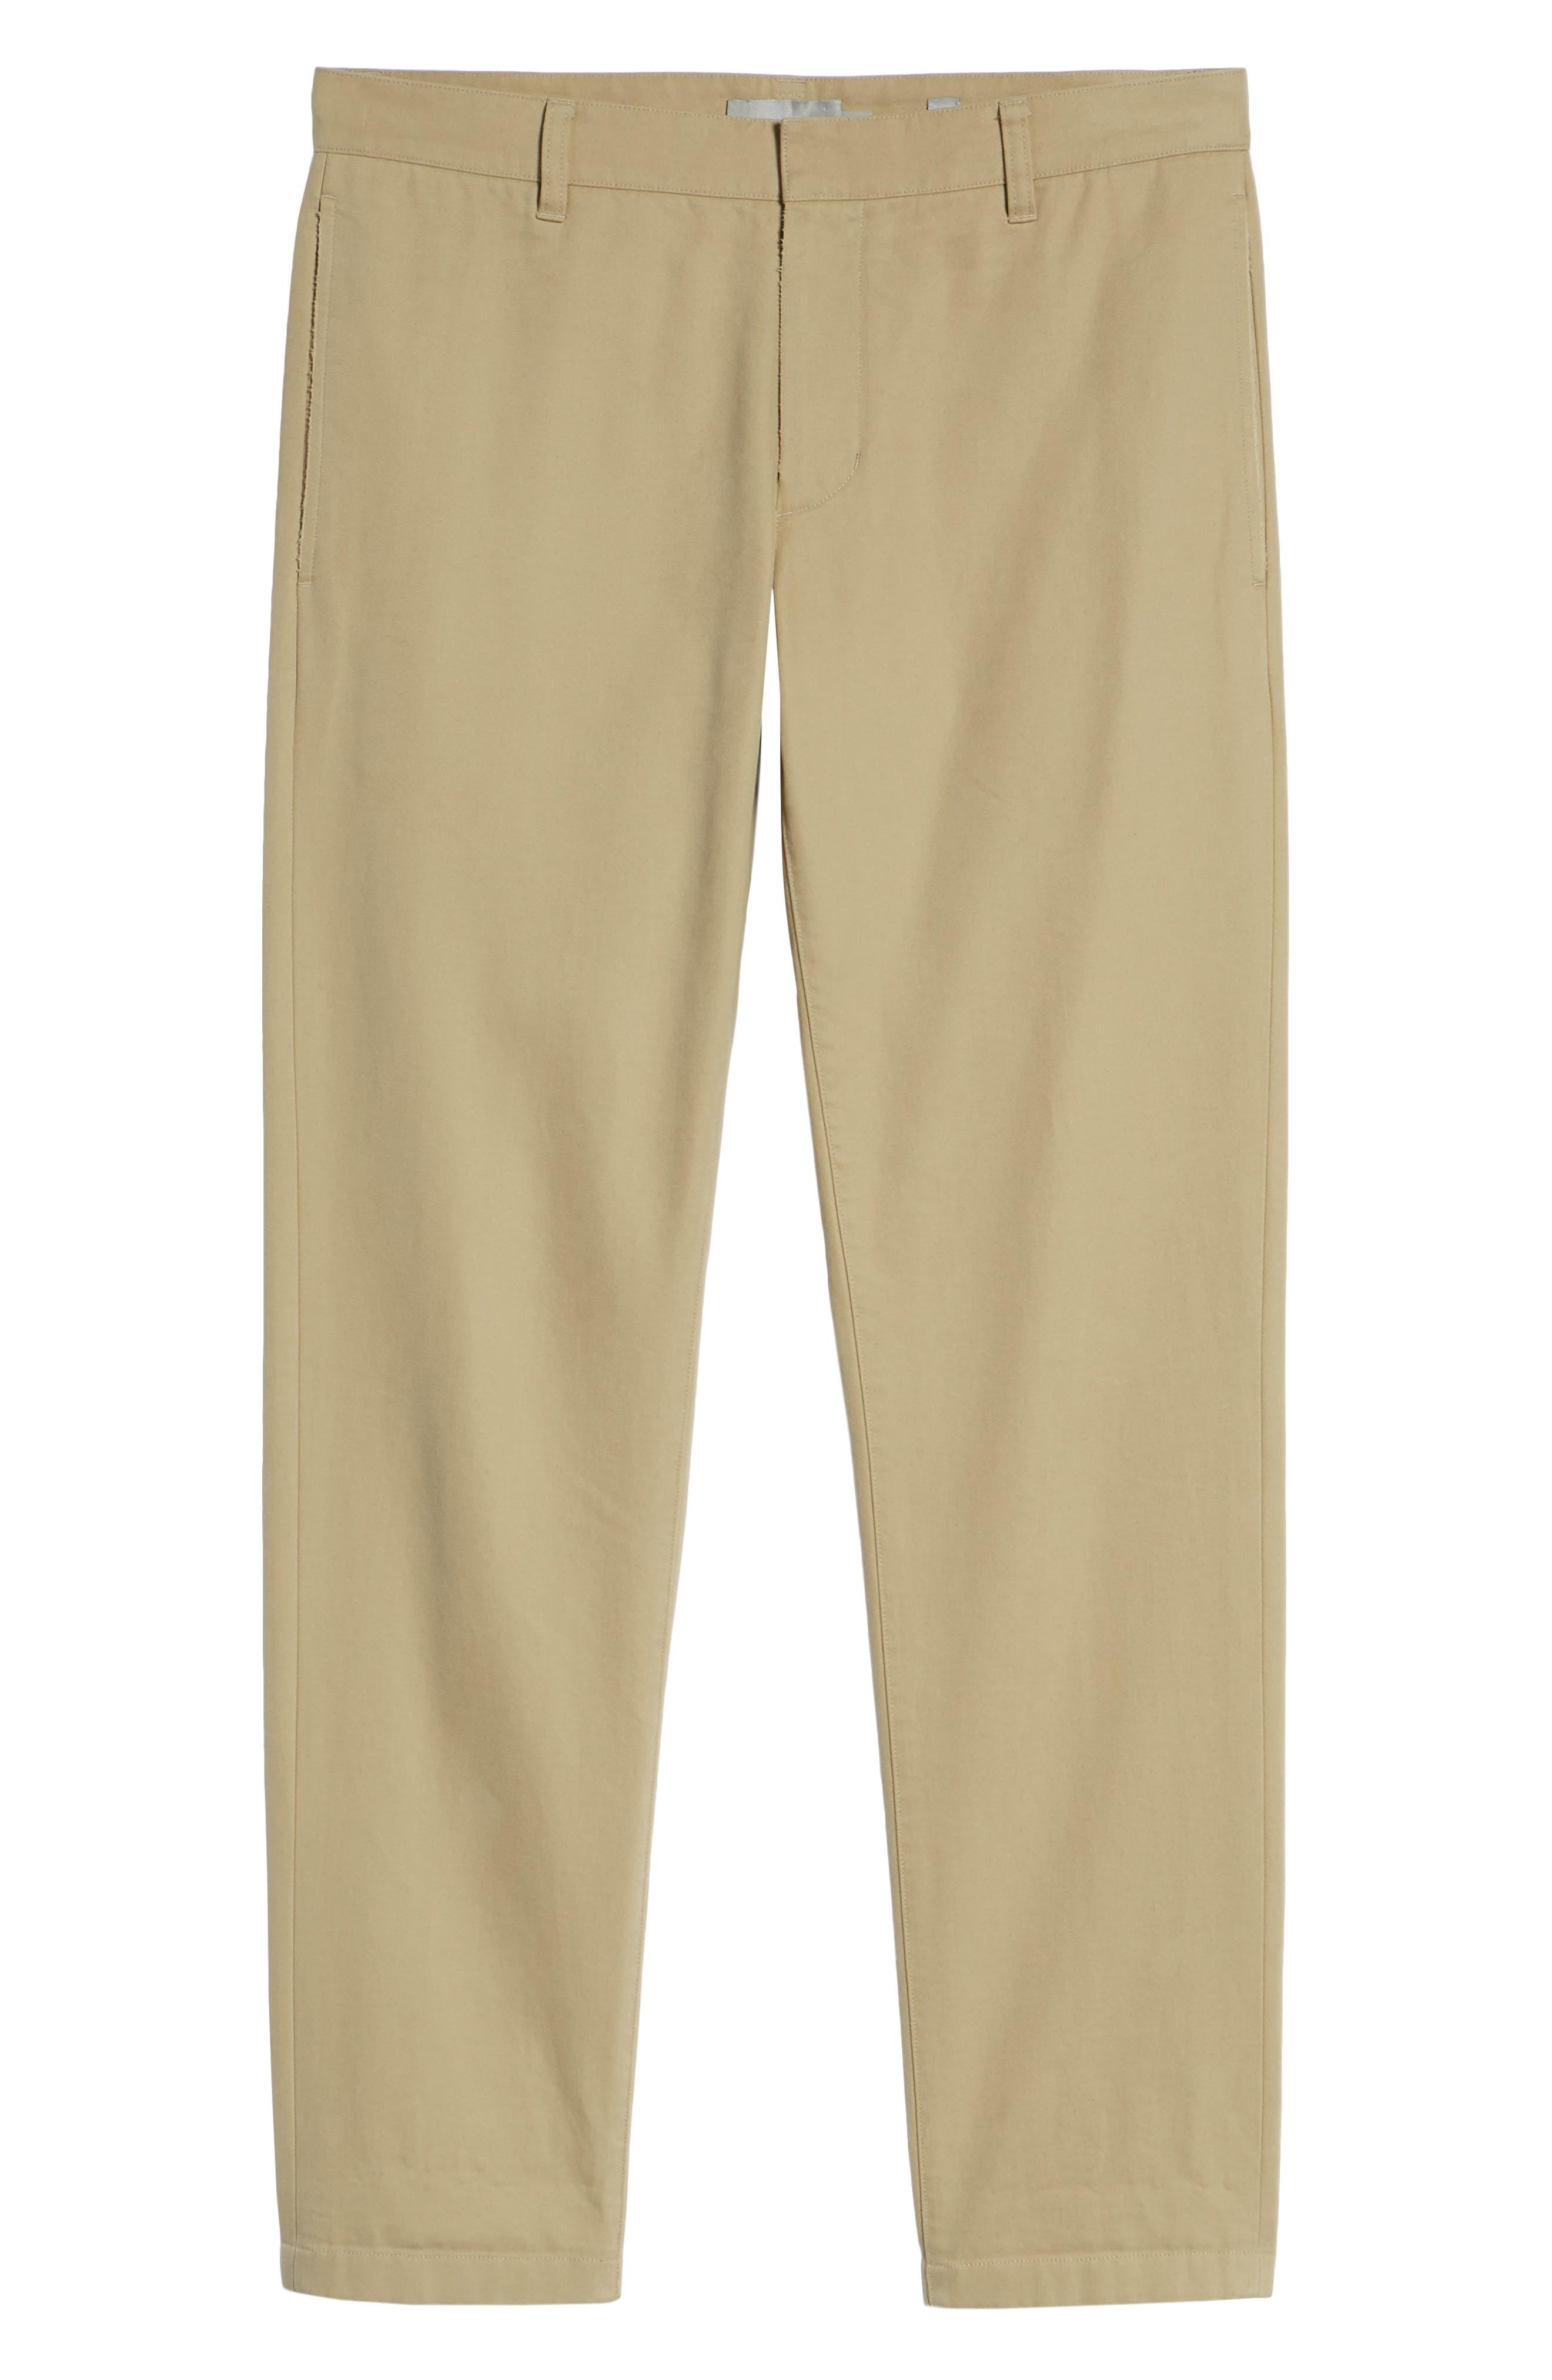 Flat Front Chino Pants,                             Alternate thumbnail 6, color,                             250